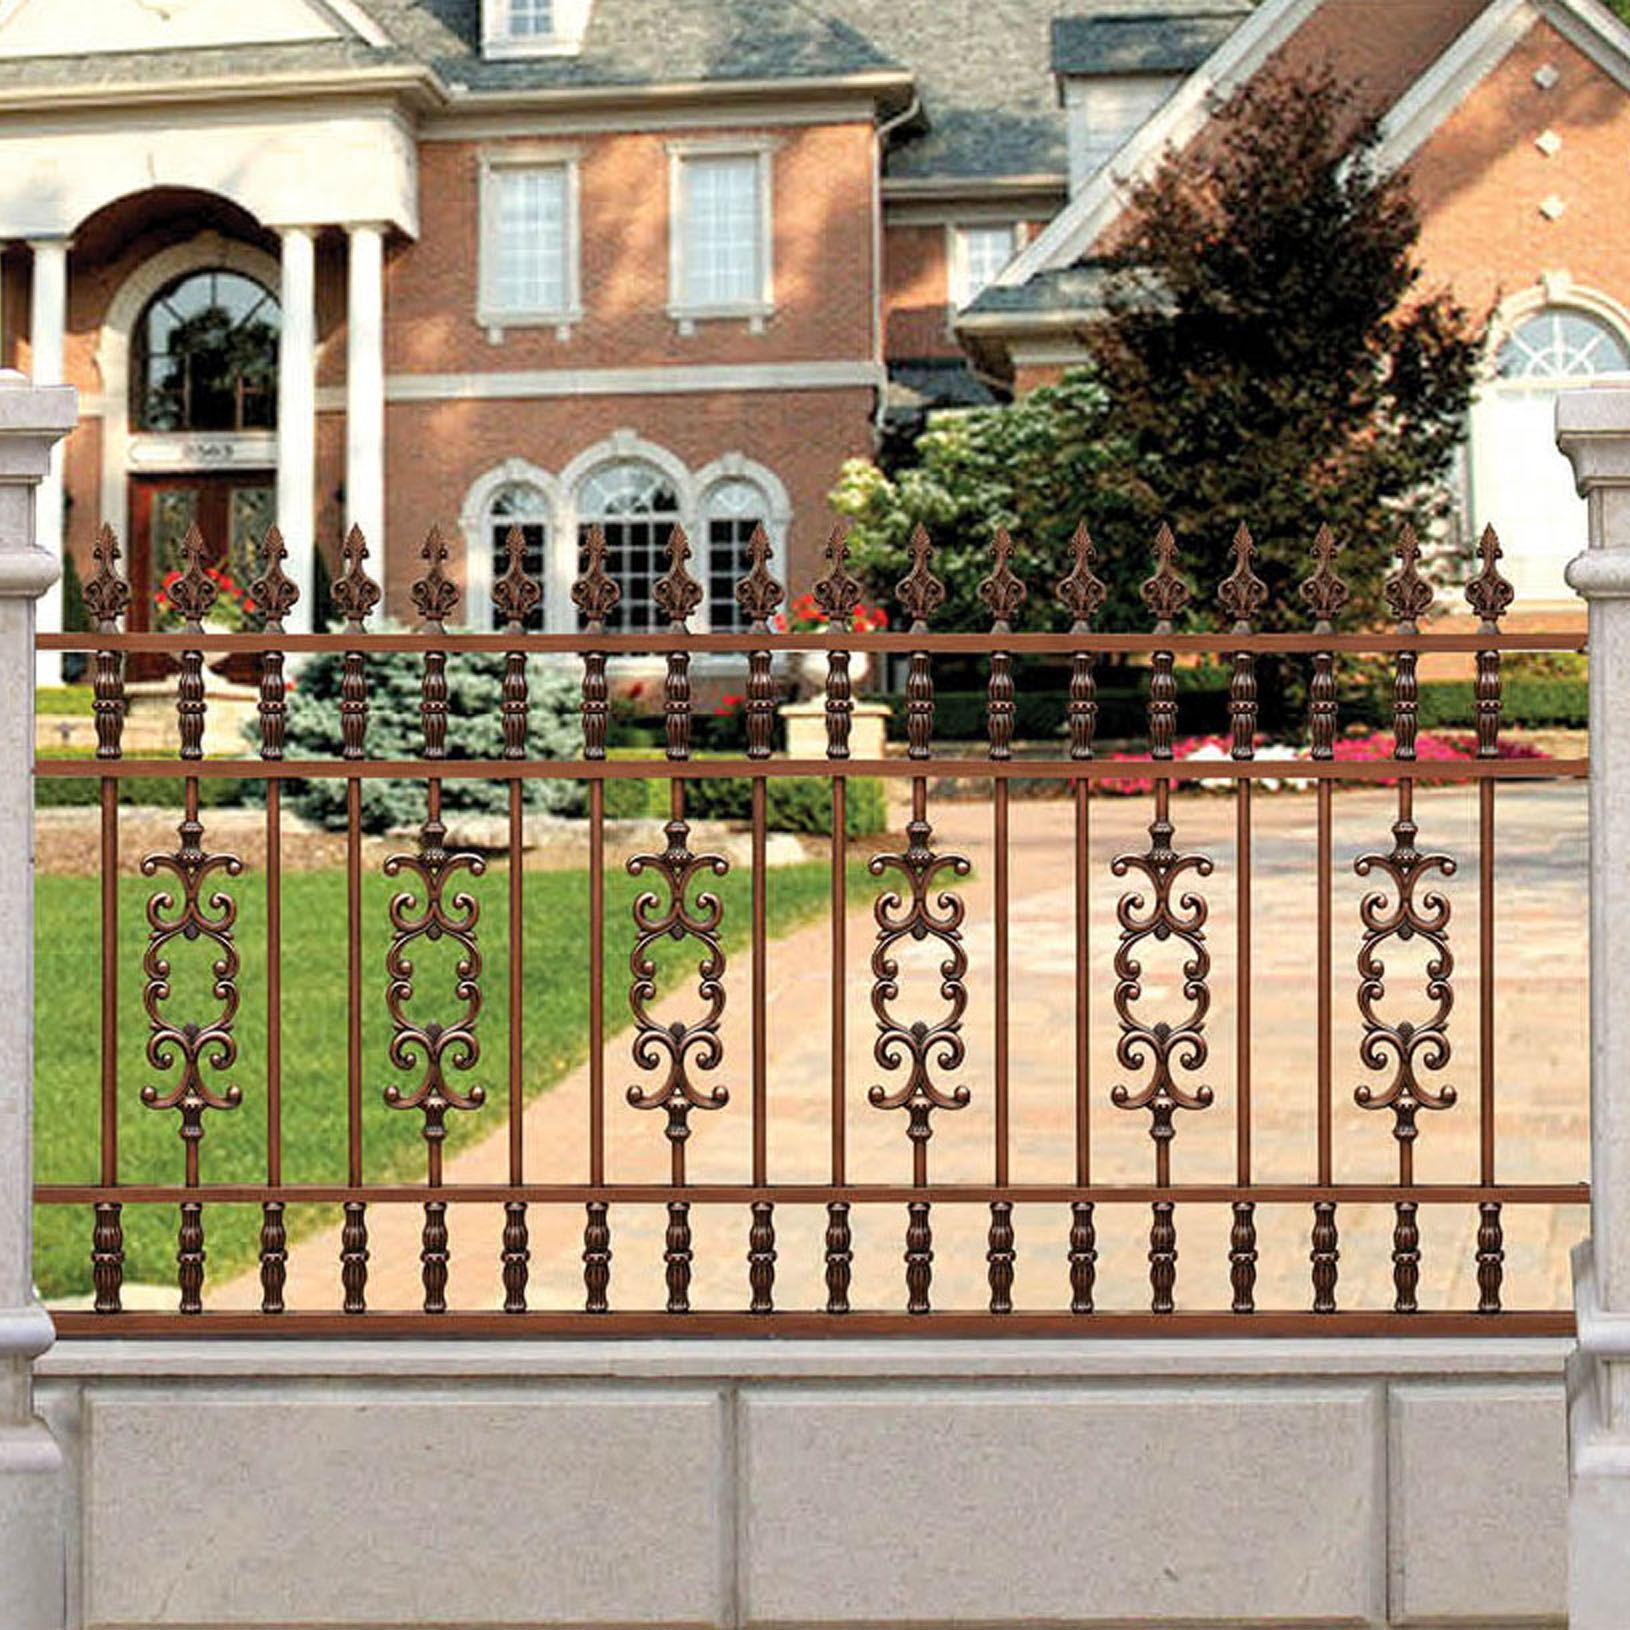 Courtyard Aluminum Fence For Garden